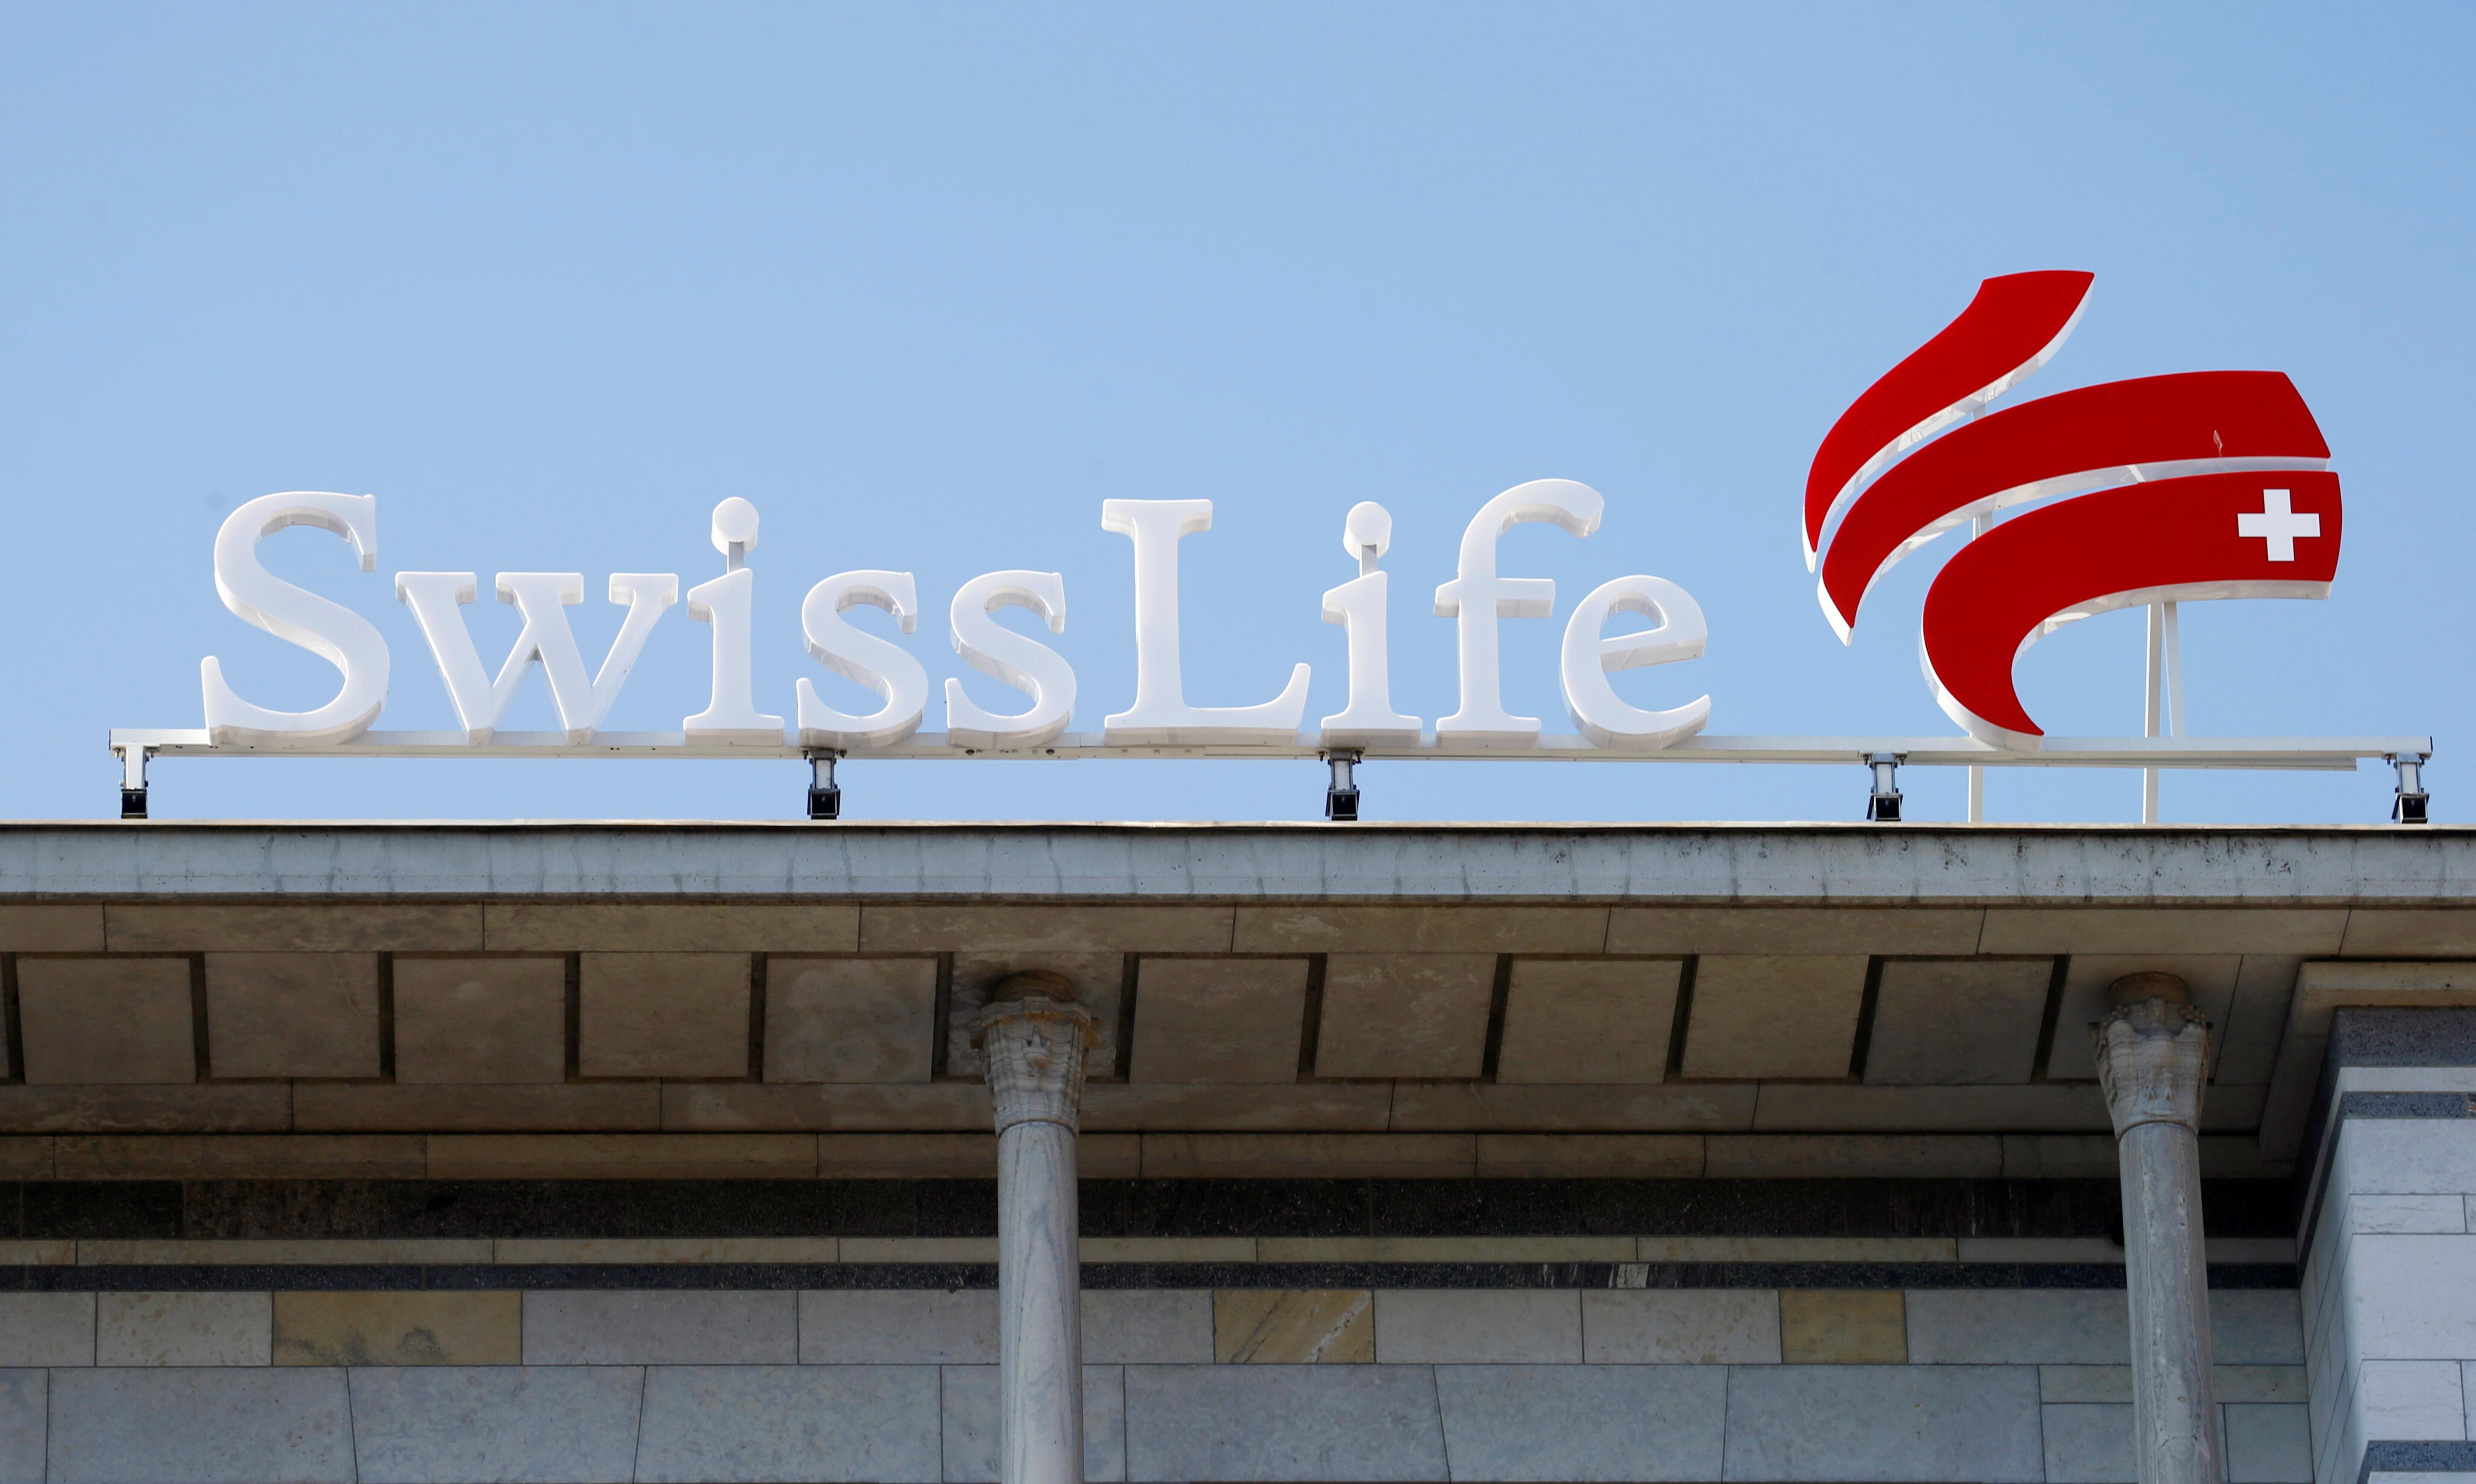 The logo of insurer Swiss Life is seen at its headquarters in Zurich, Switzerland March 2, 2021. REUTERS/Arnd Wiegmann